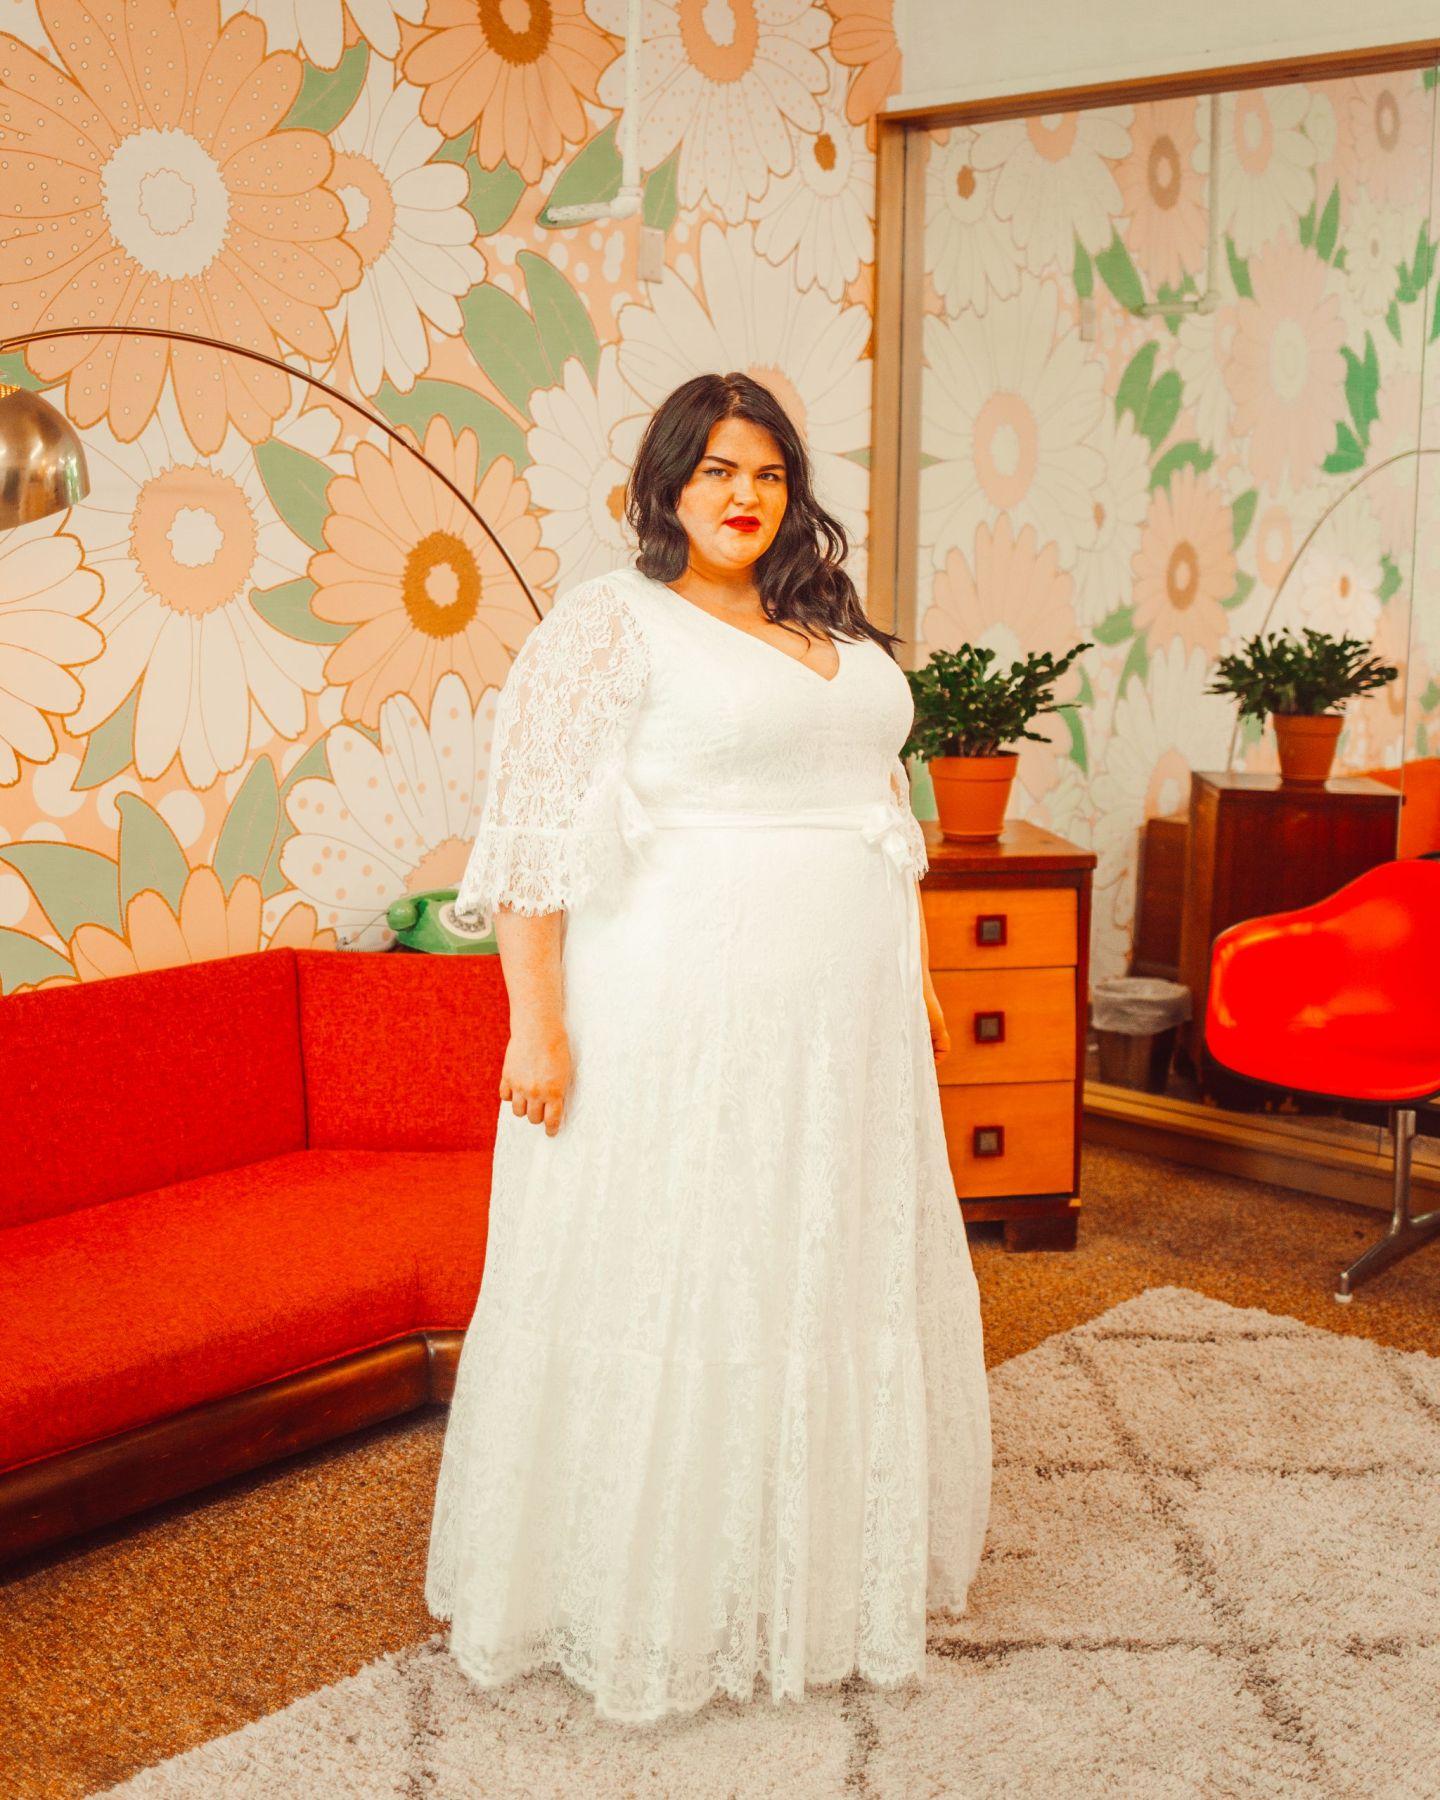 Plus Size White Dresses For Bridal Shower – DACC